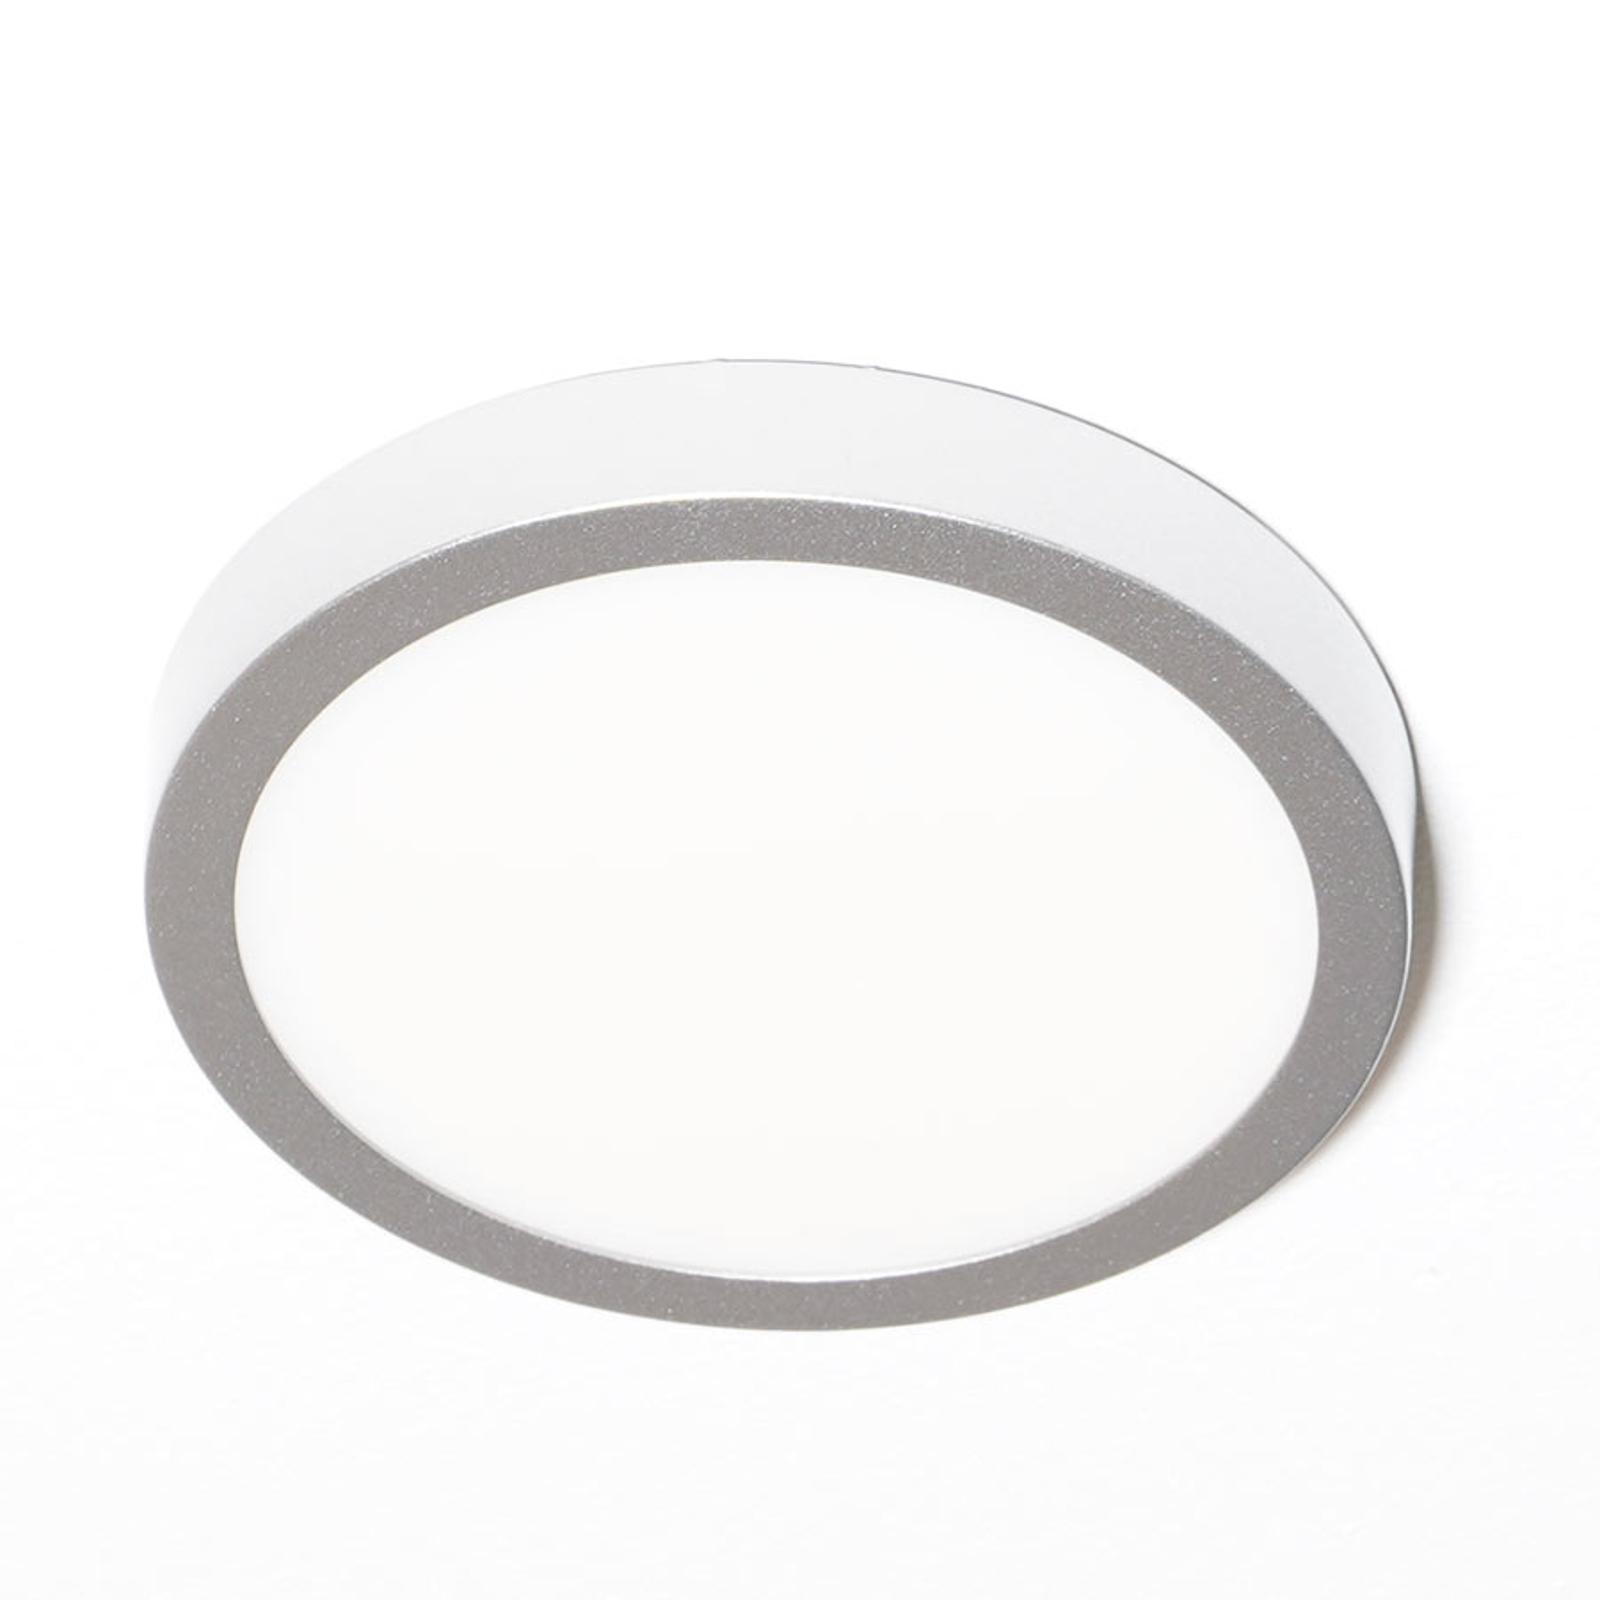 Bardzo płaska lampa sufitowa LED Vika, 18 cm